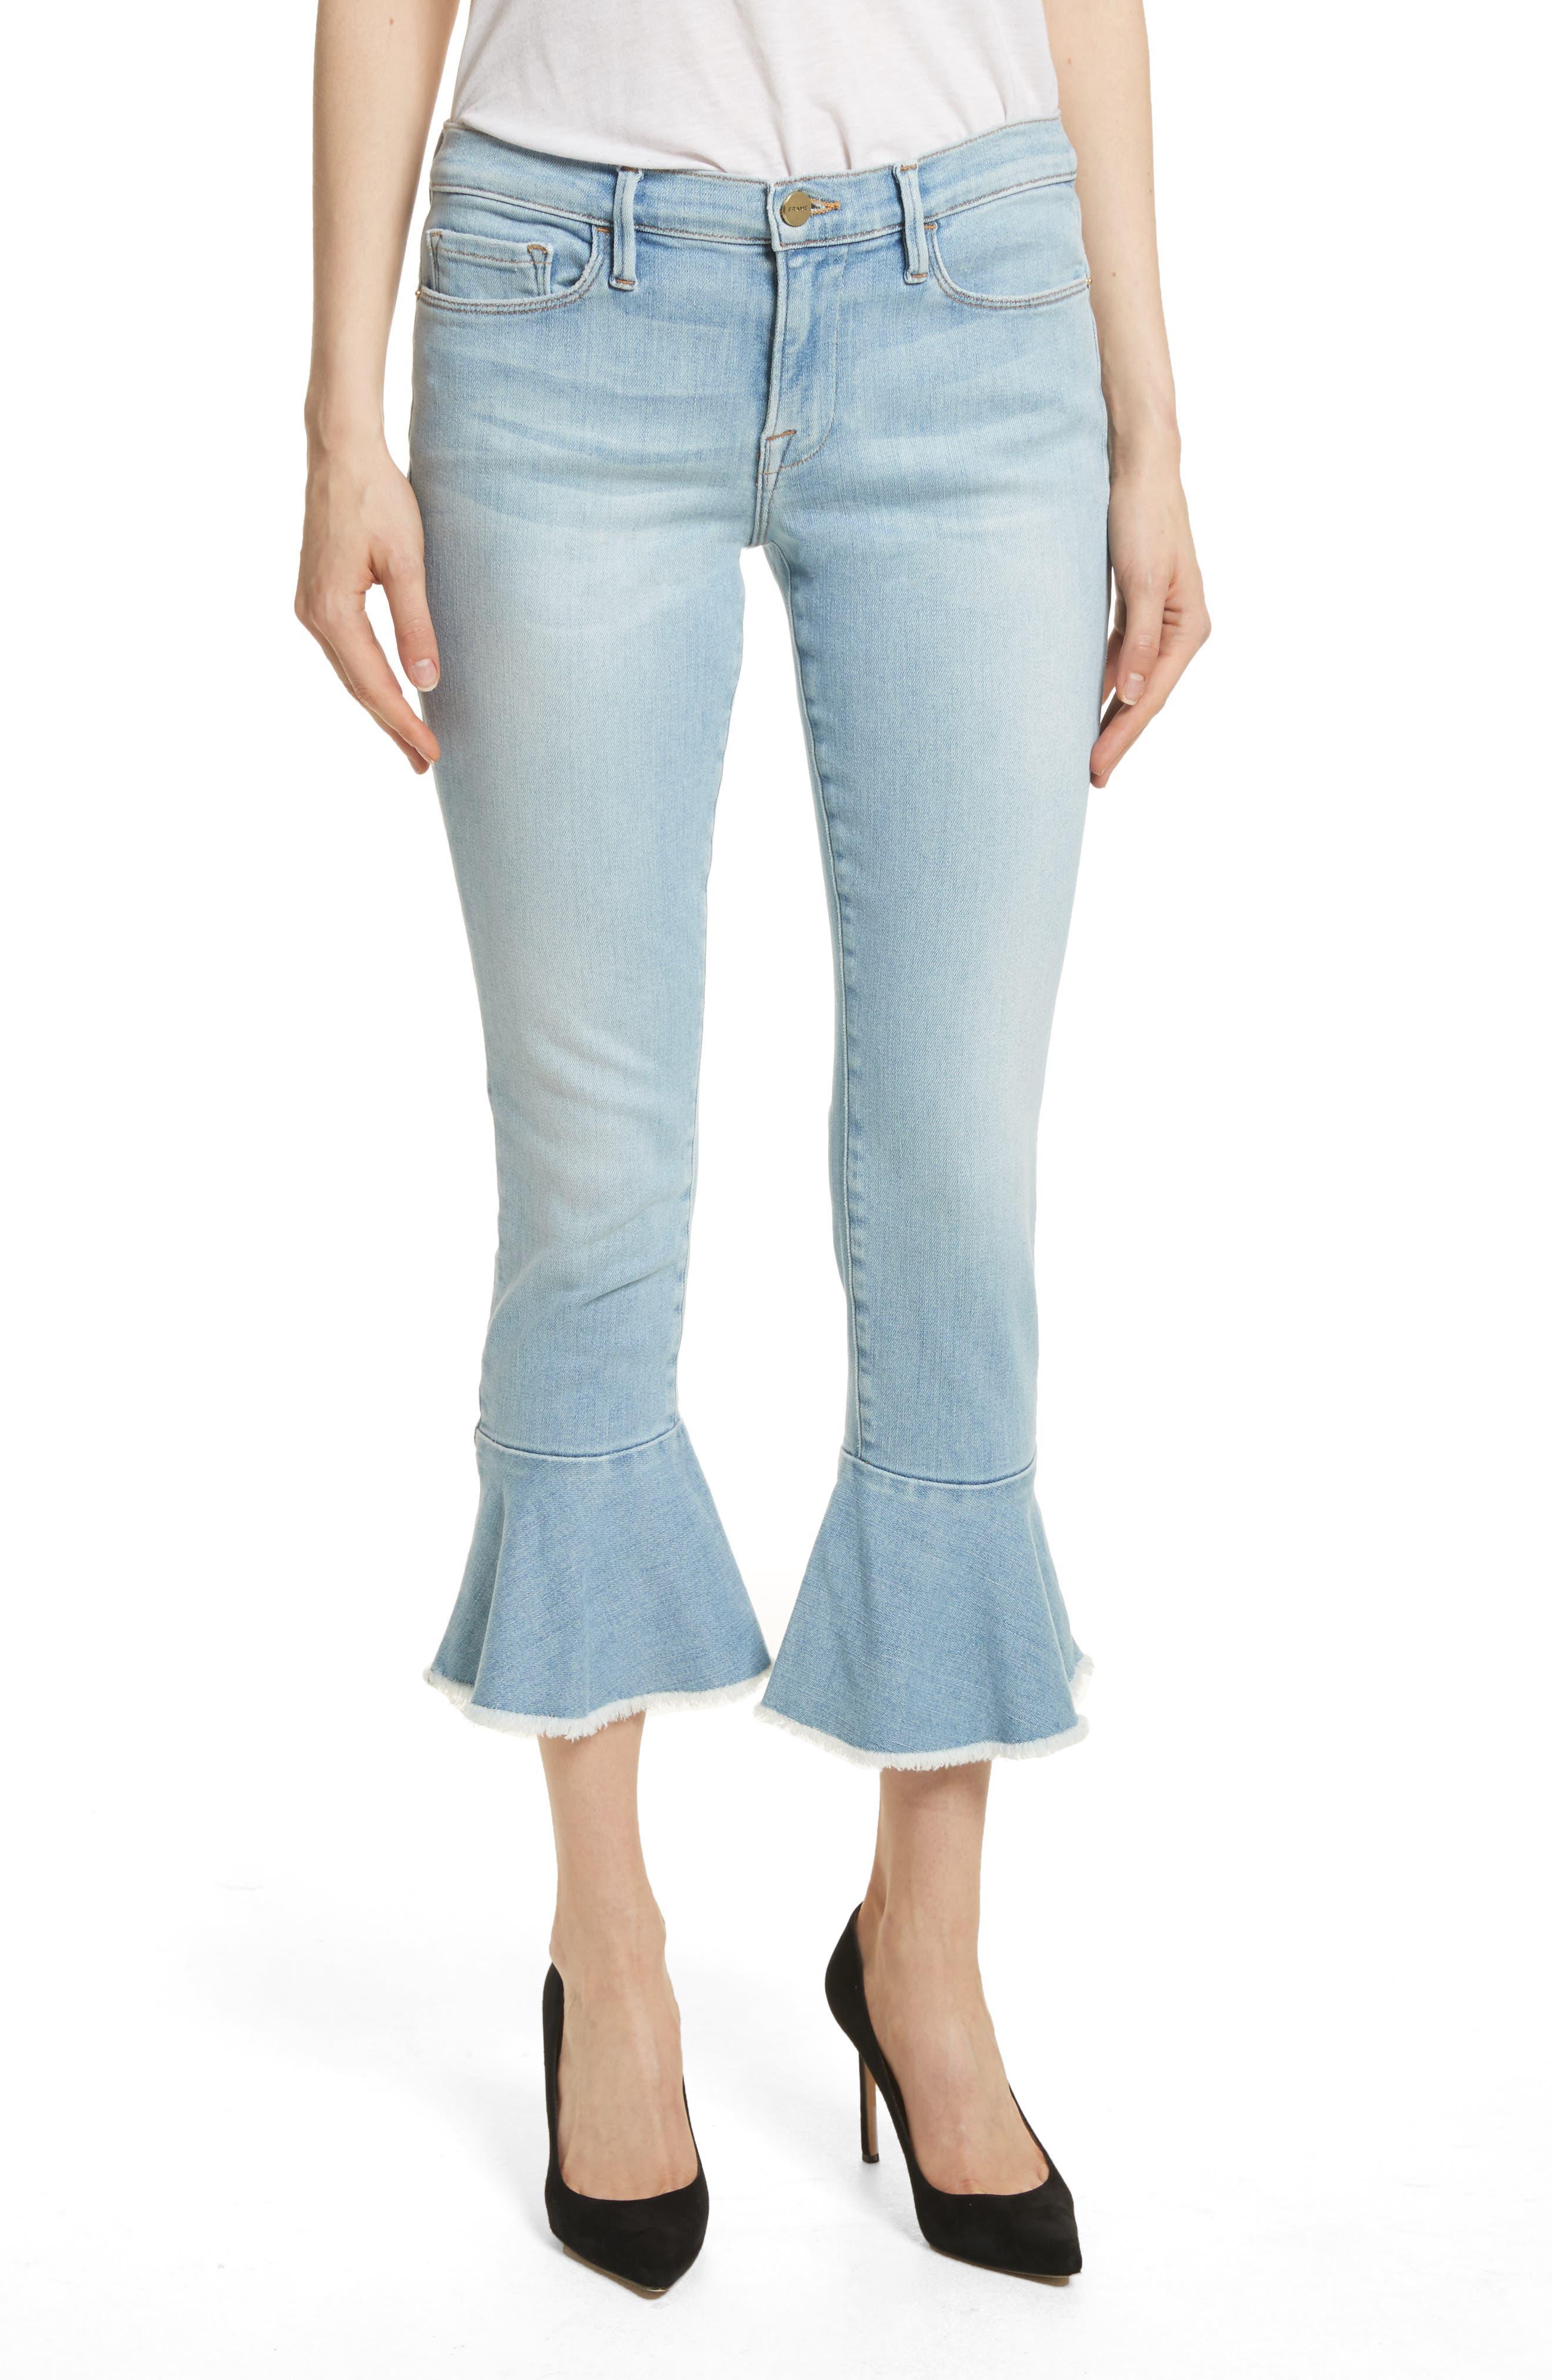 Le Skinny de Jeanne Flounce Skinny Jeans,                         Main,                         color, Limer Stone